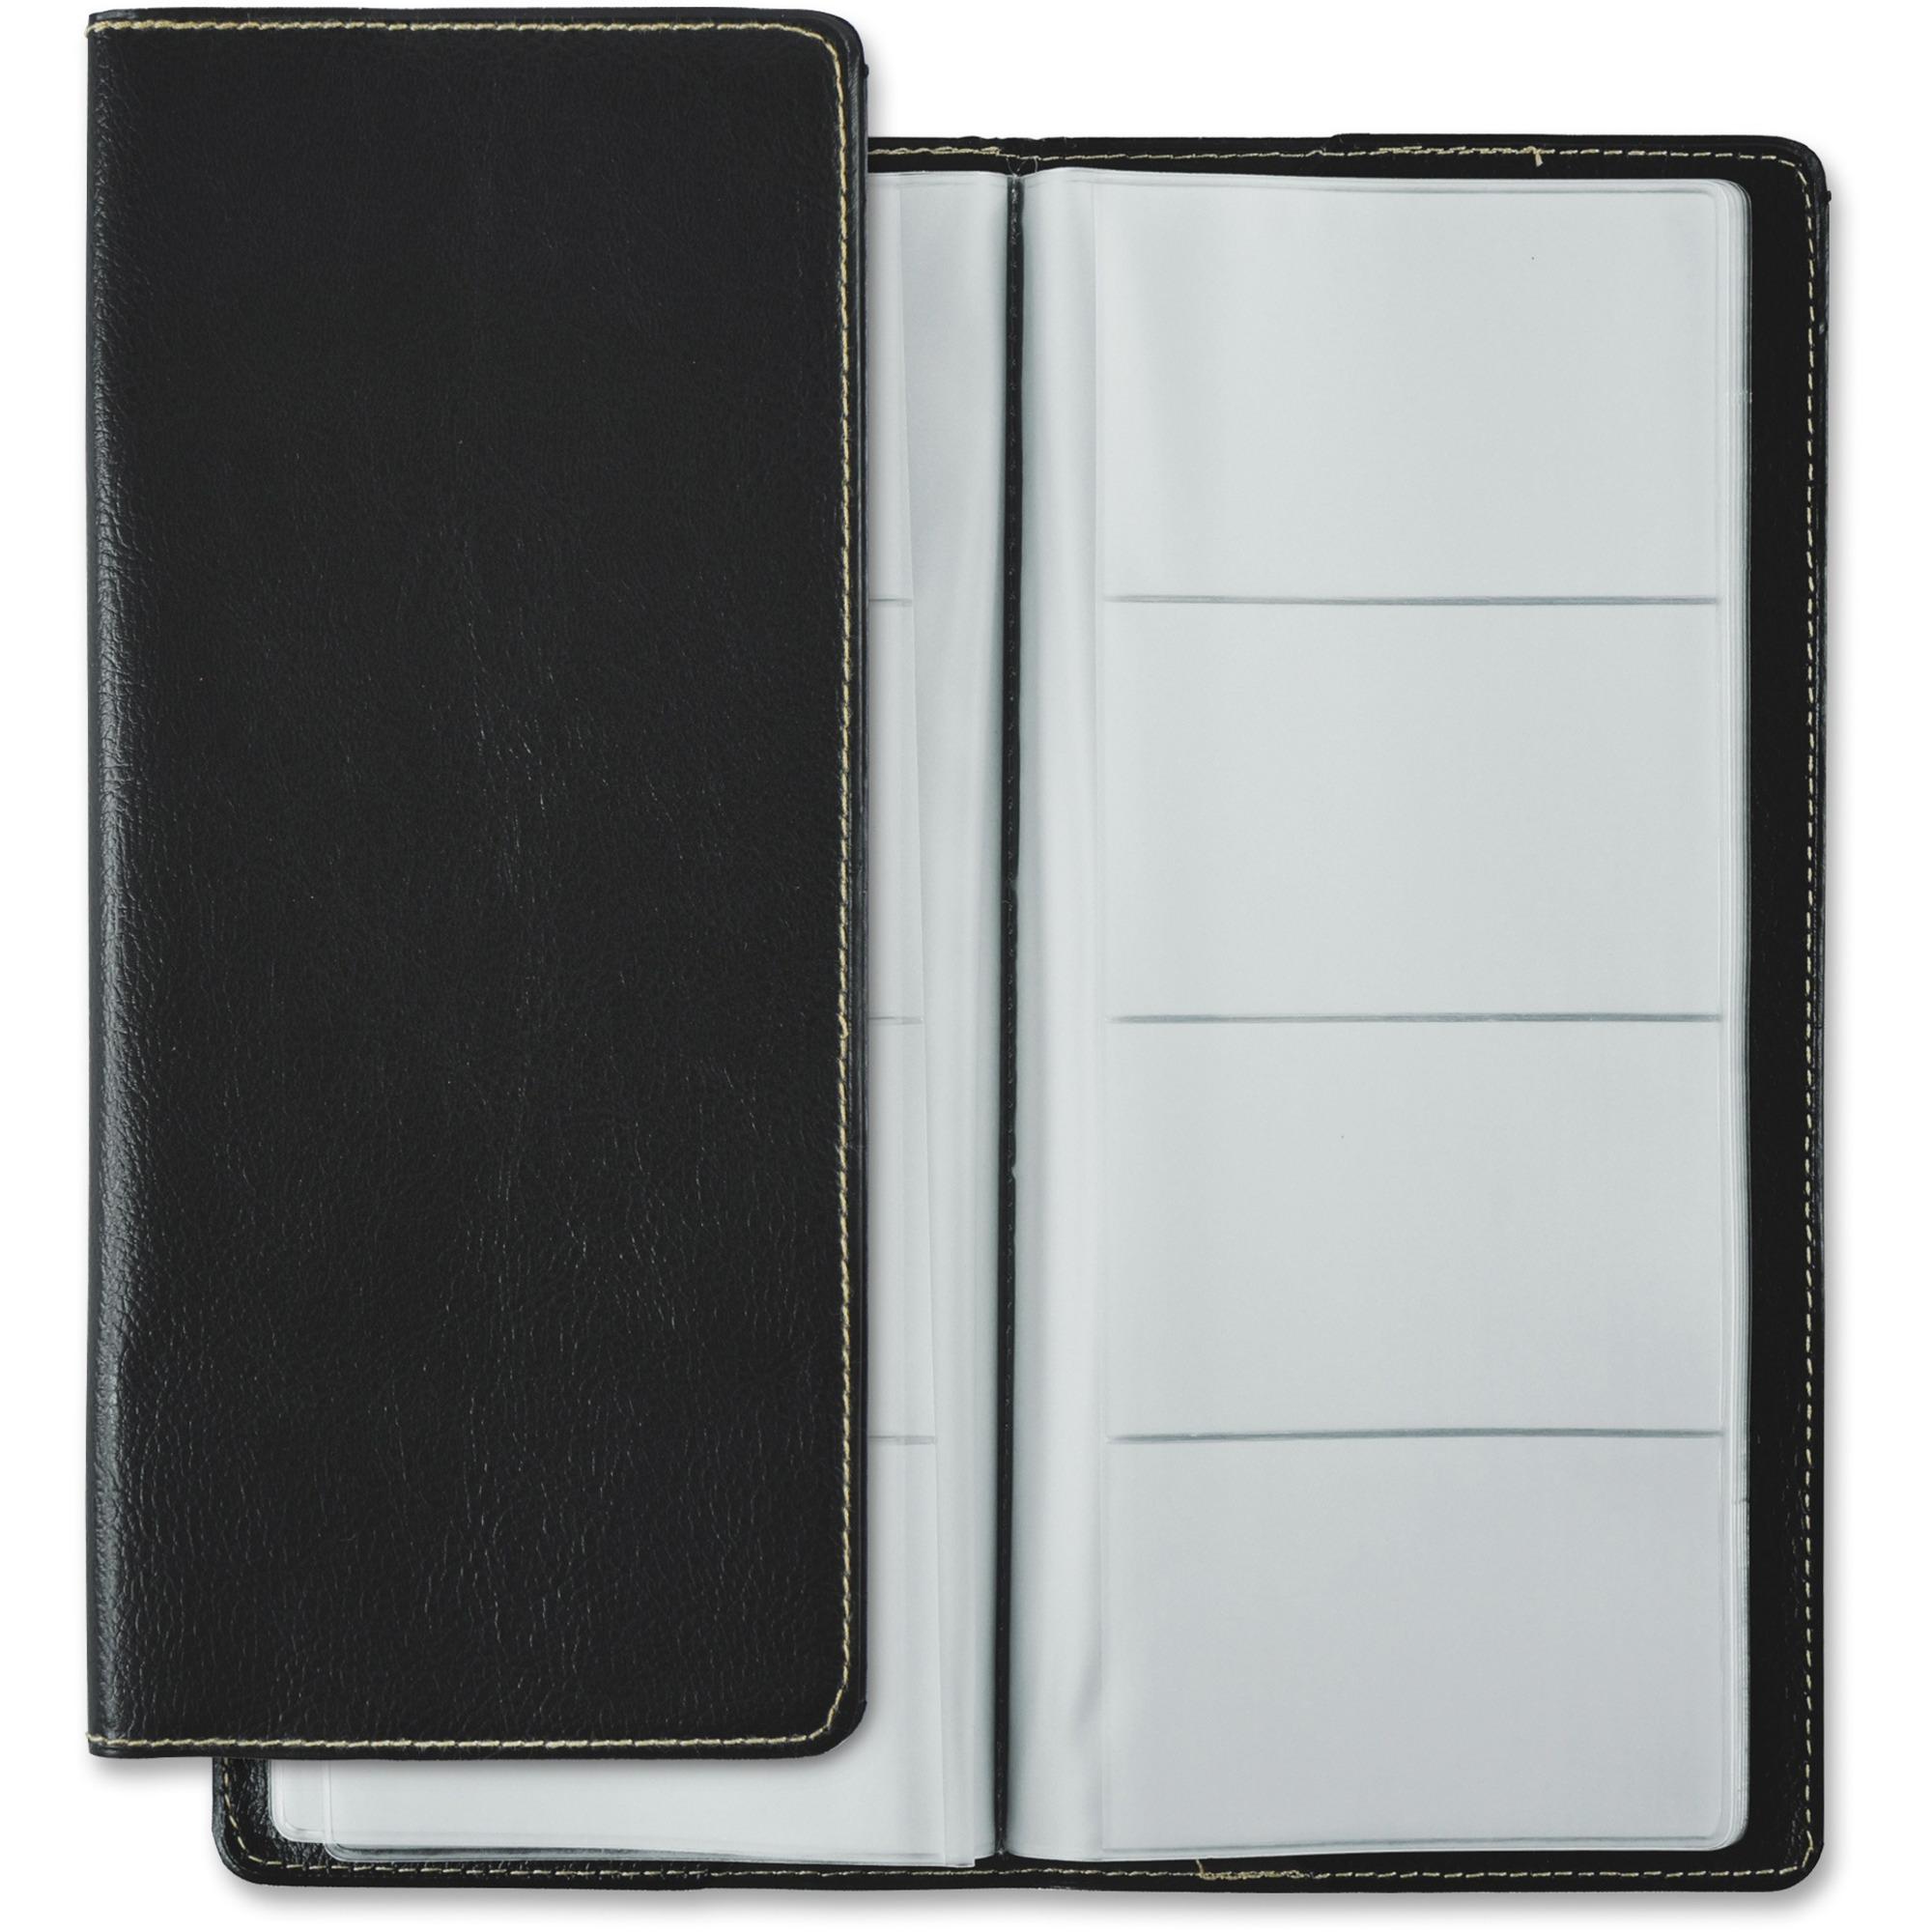 Winnable Business Card Holder Nc 96 Bk Capacity Width Black Cover